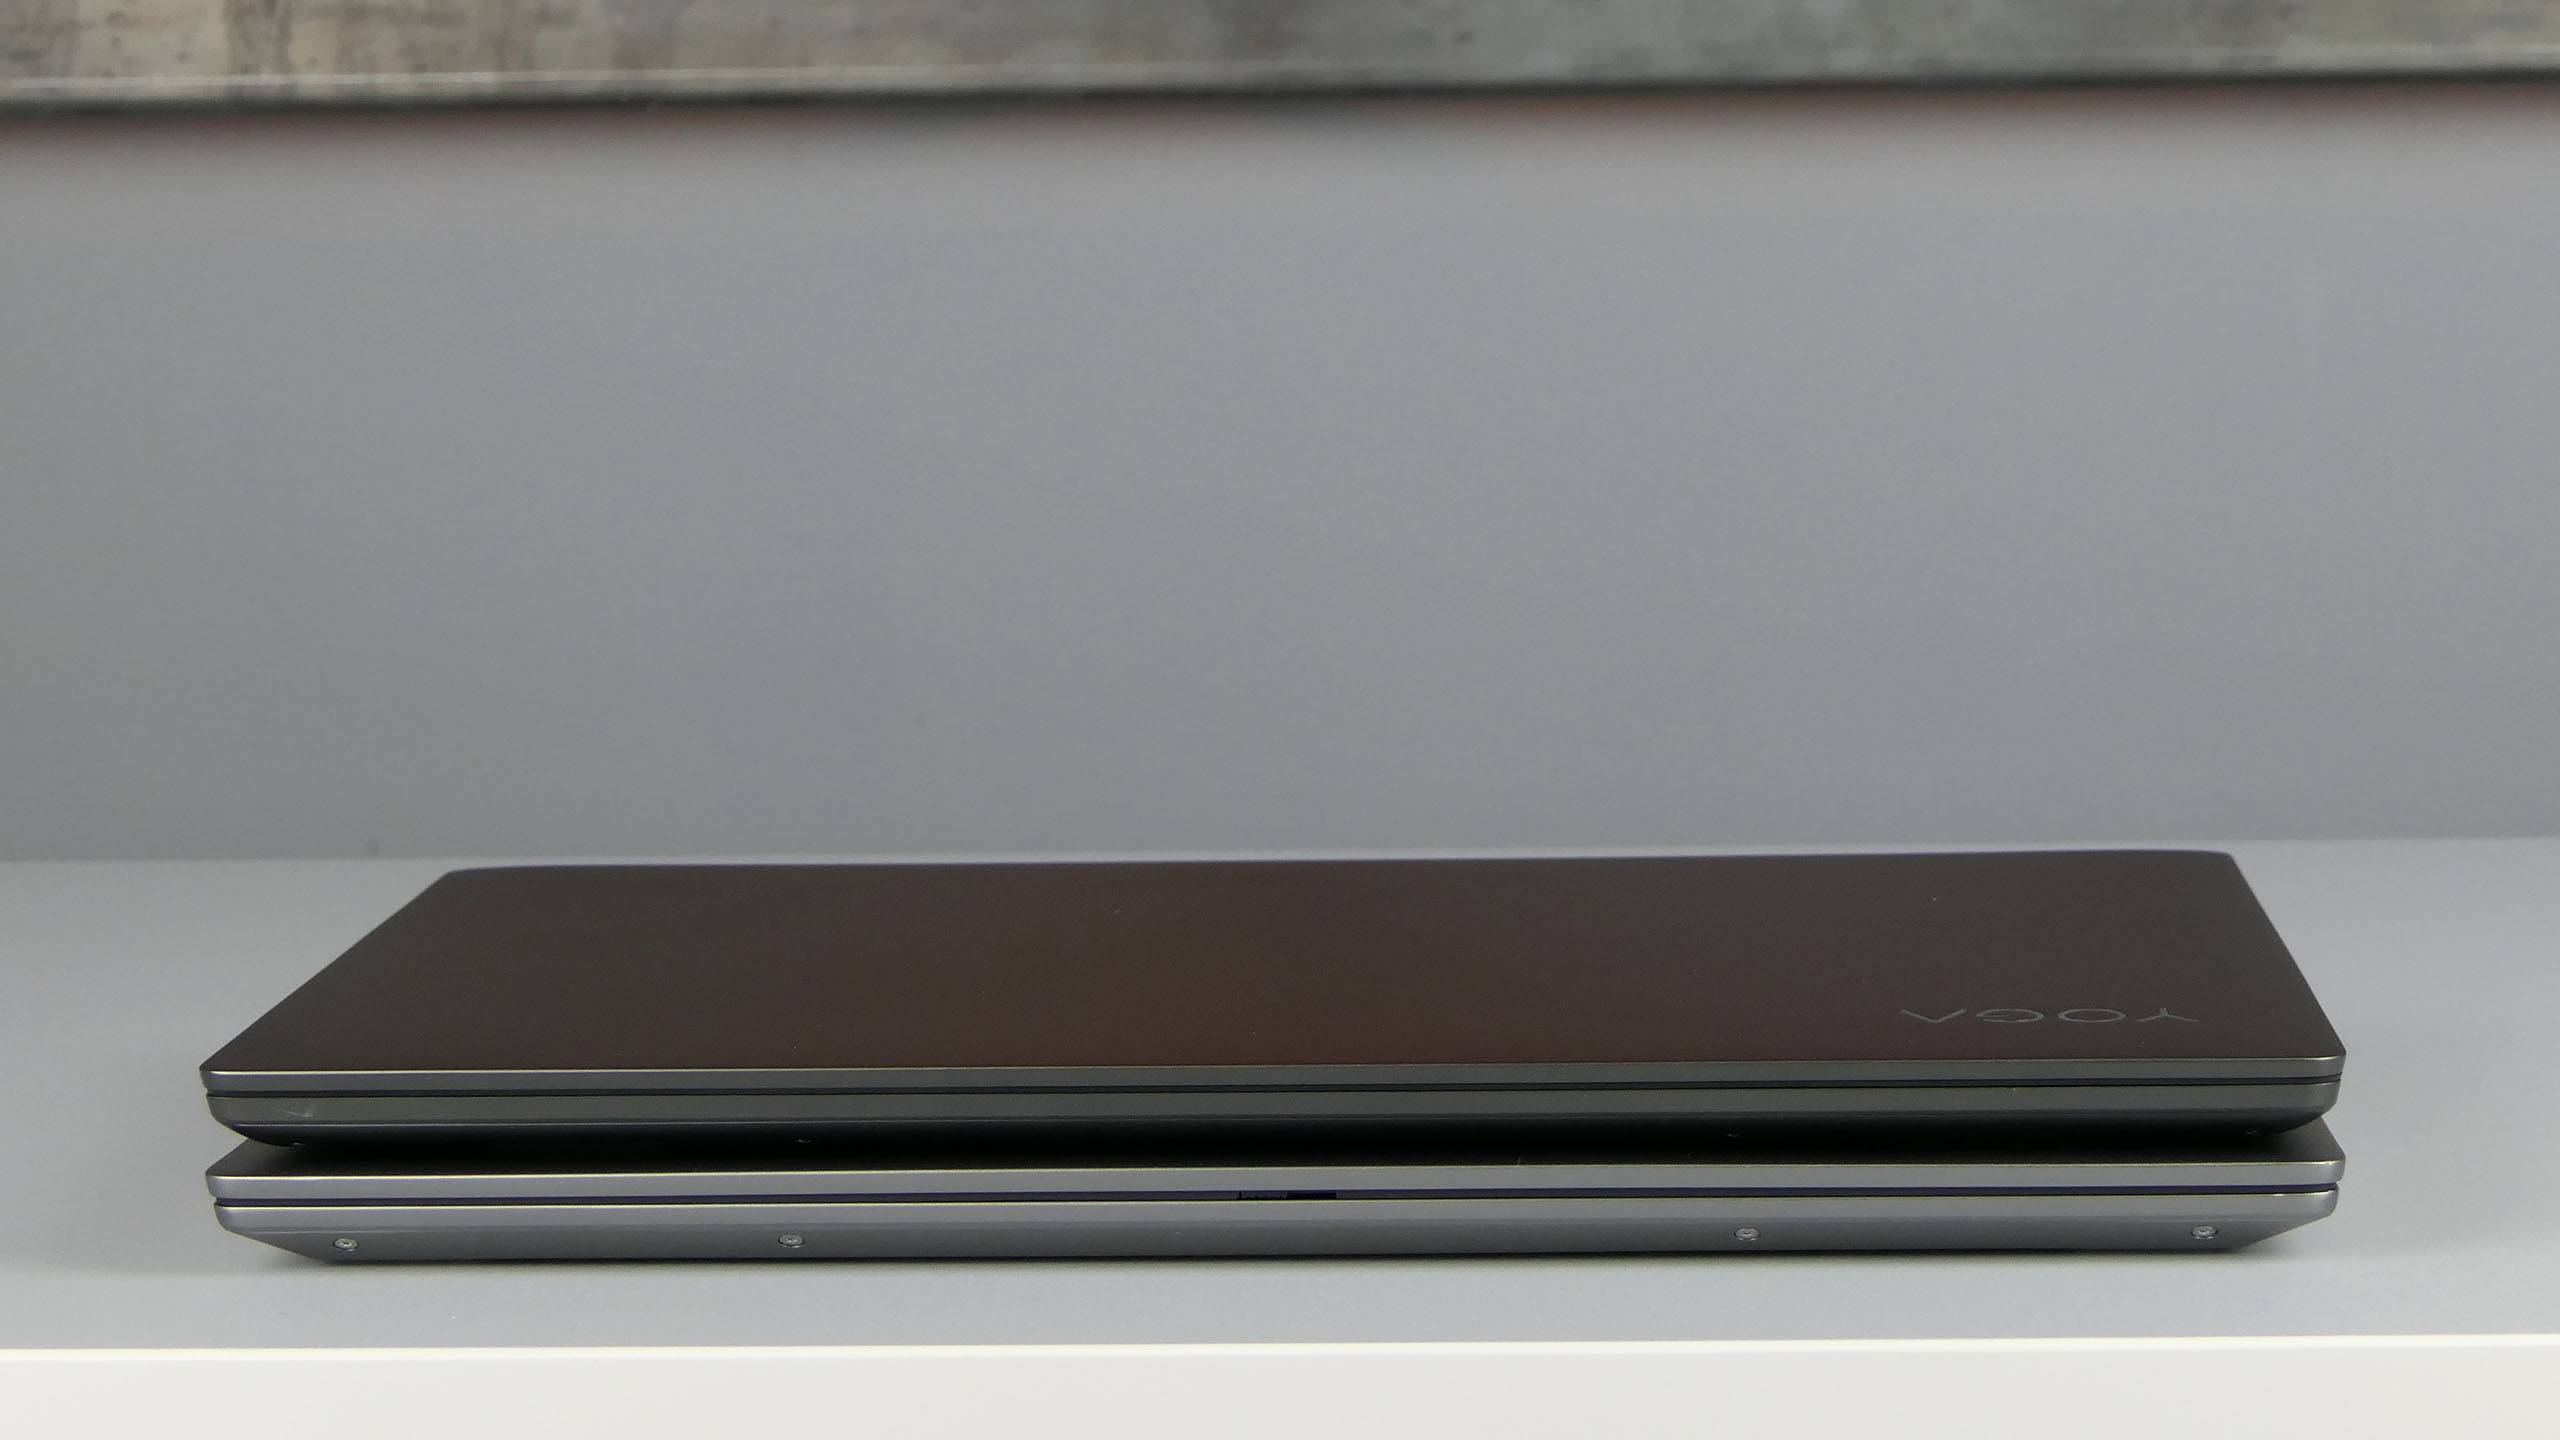 Lenovo IdeaPad S540 (14) orazYoga S740 (14) - front ultrabooków